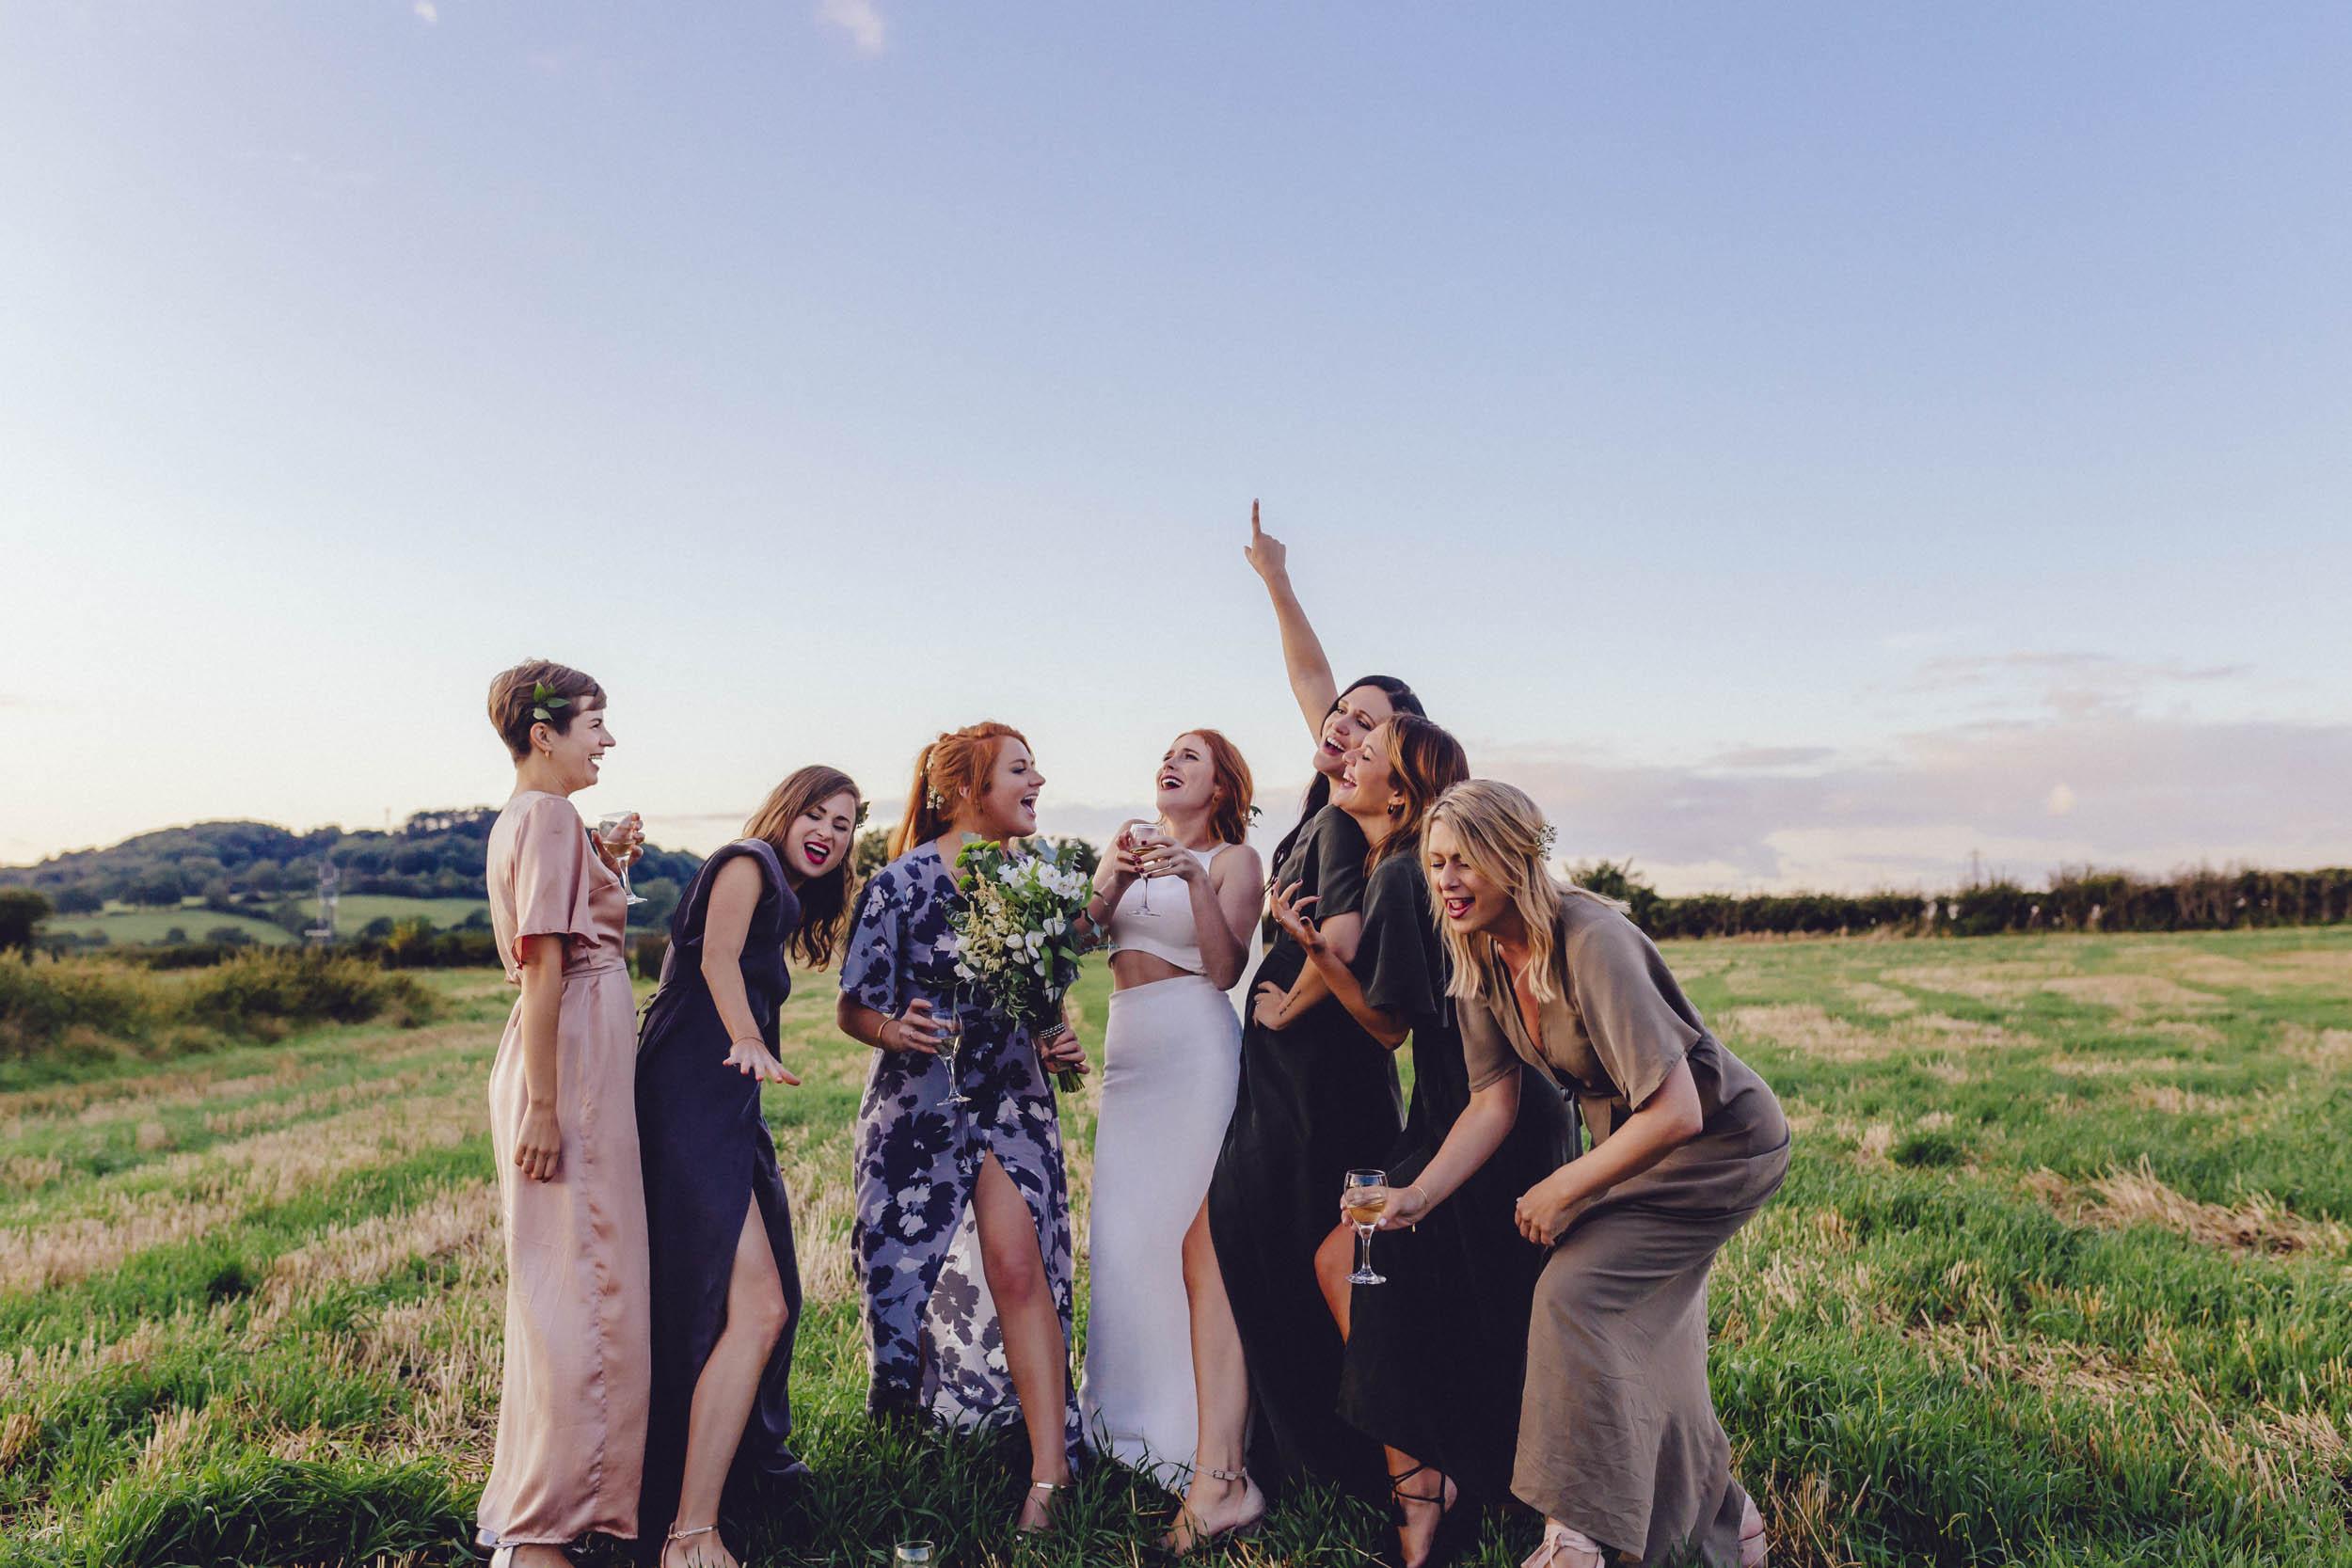 Brockworth court barn-unconventional fun wedding photography075.jpg